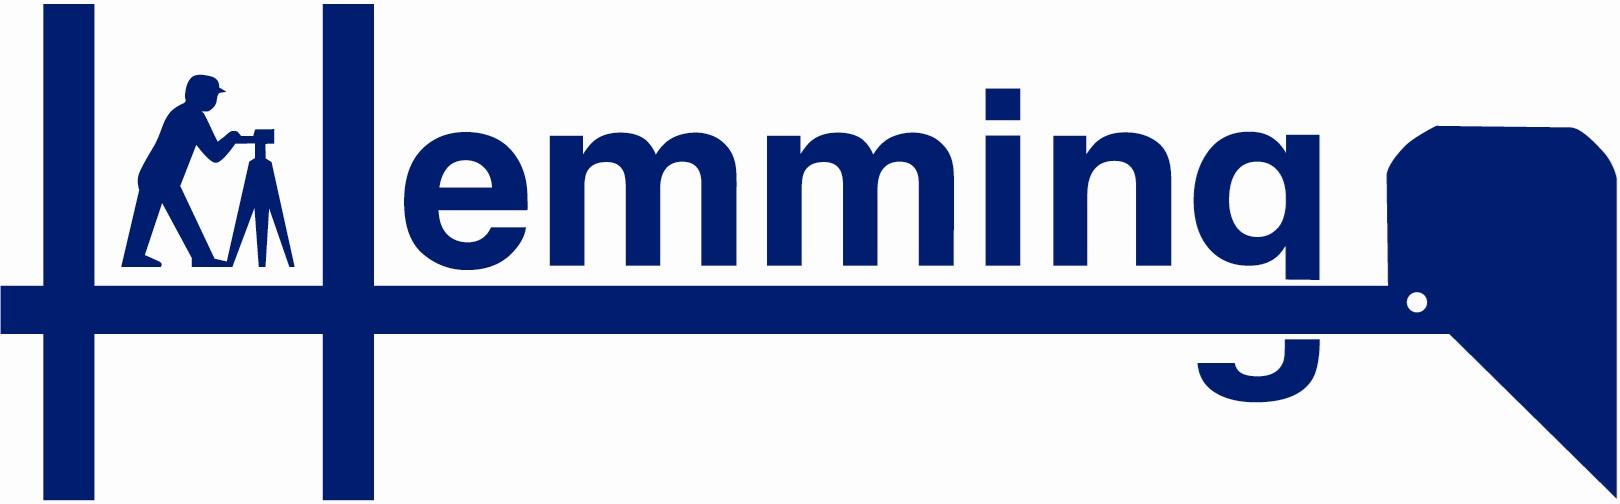 Hemming